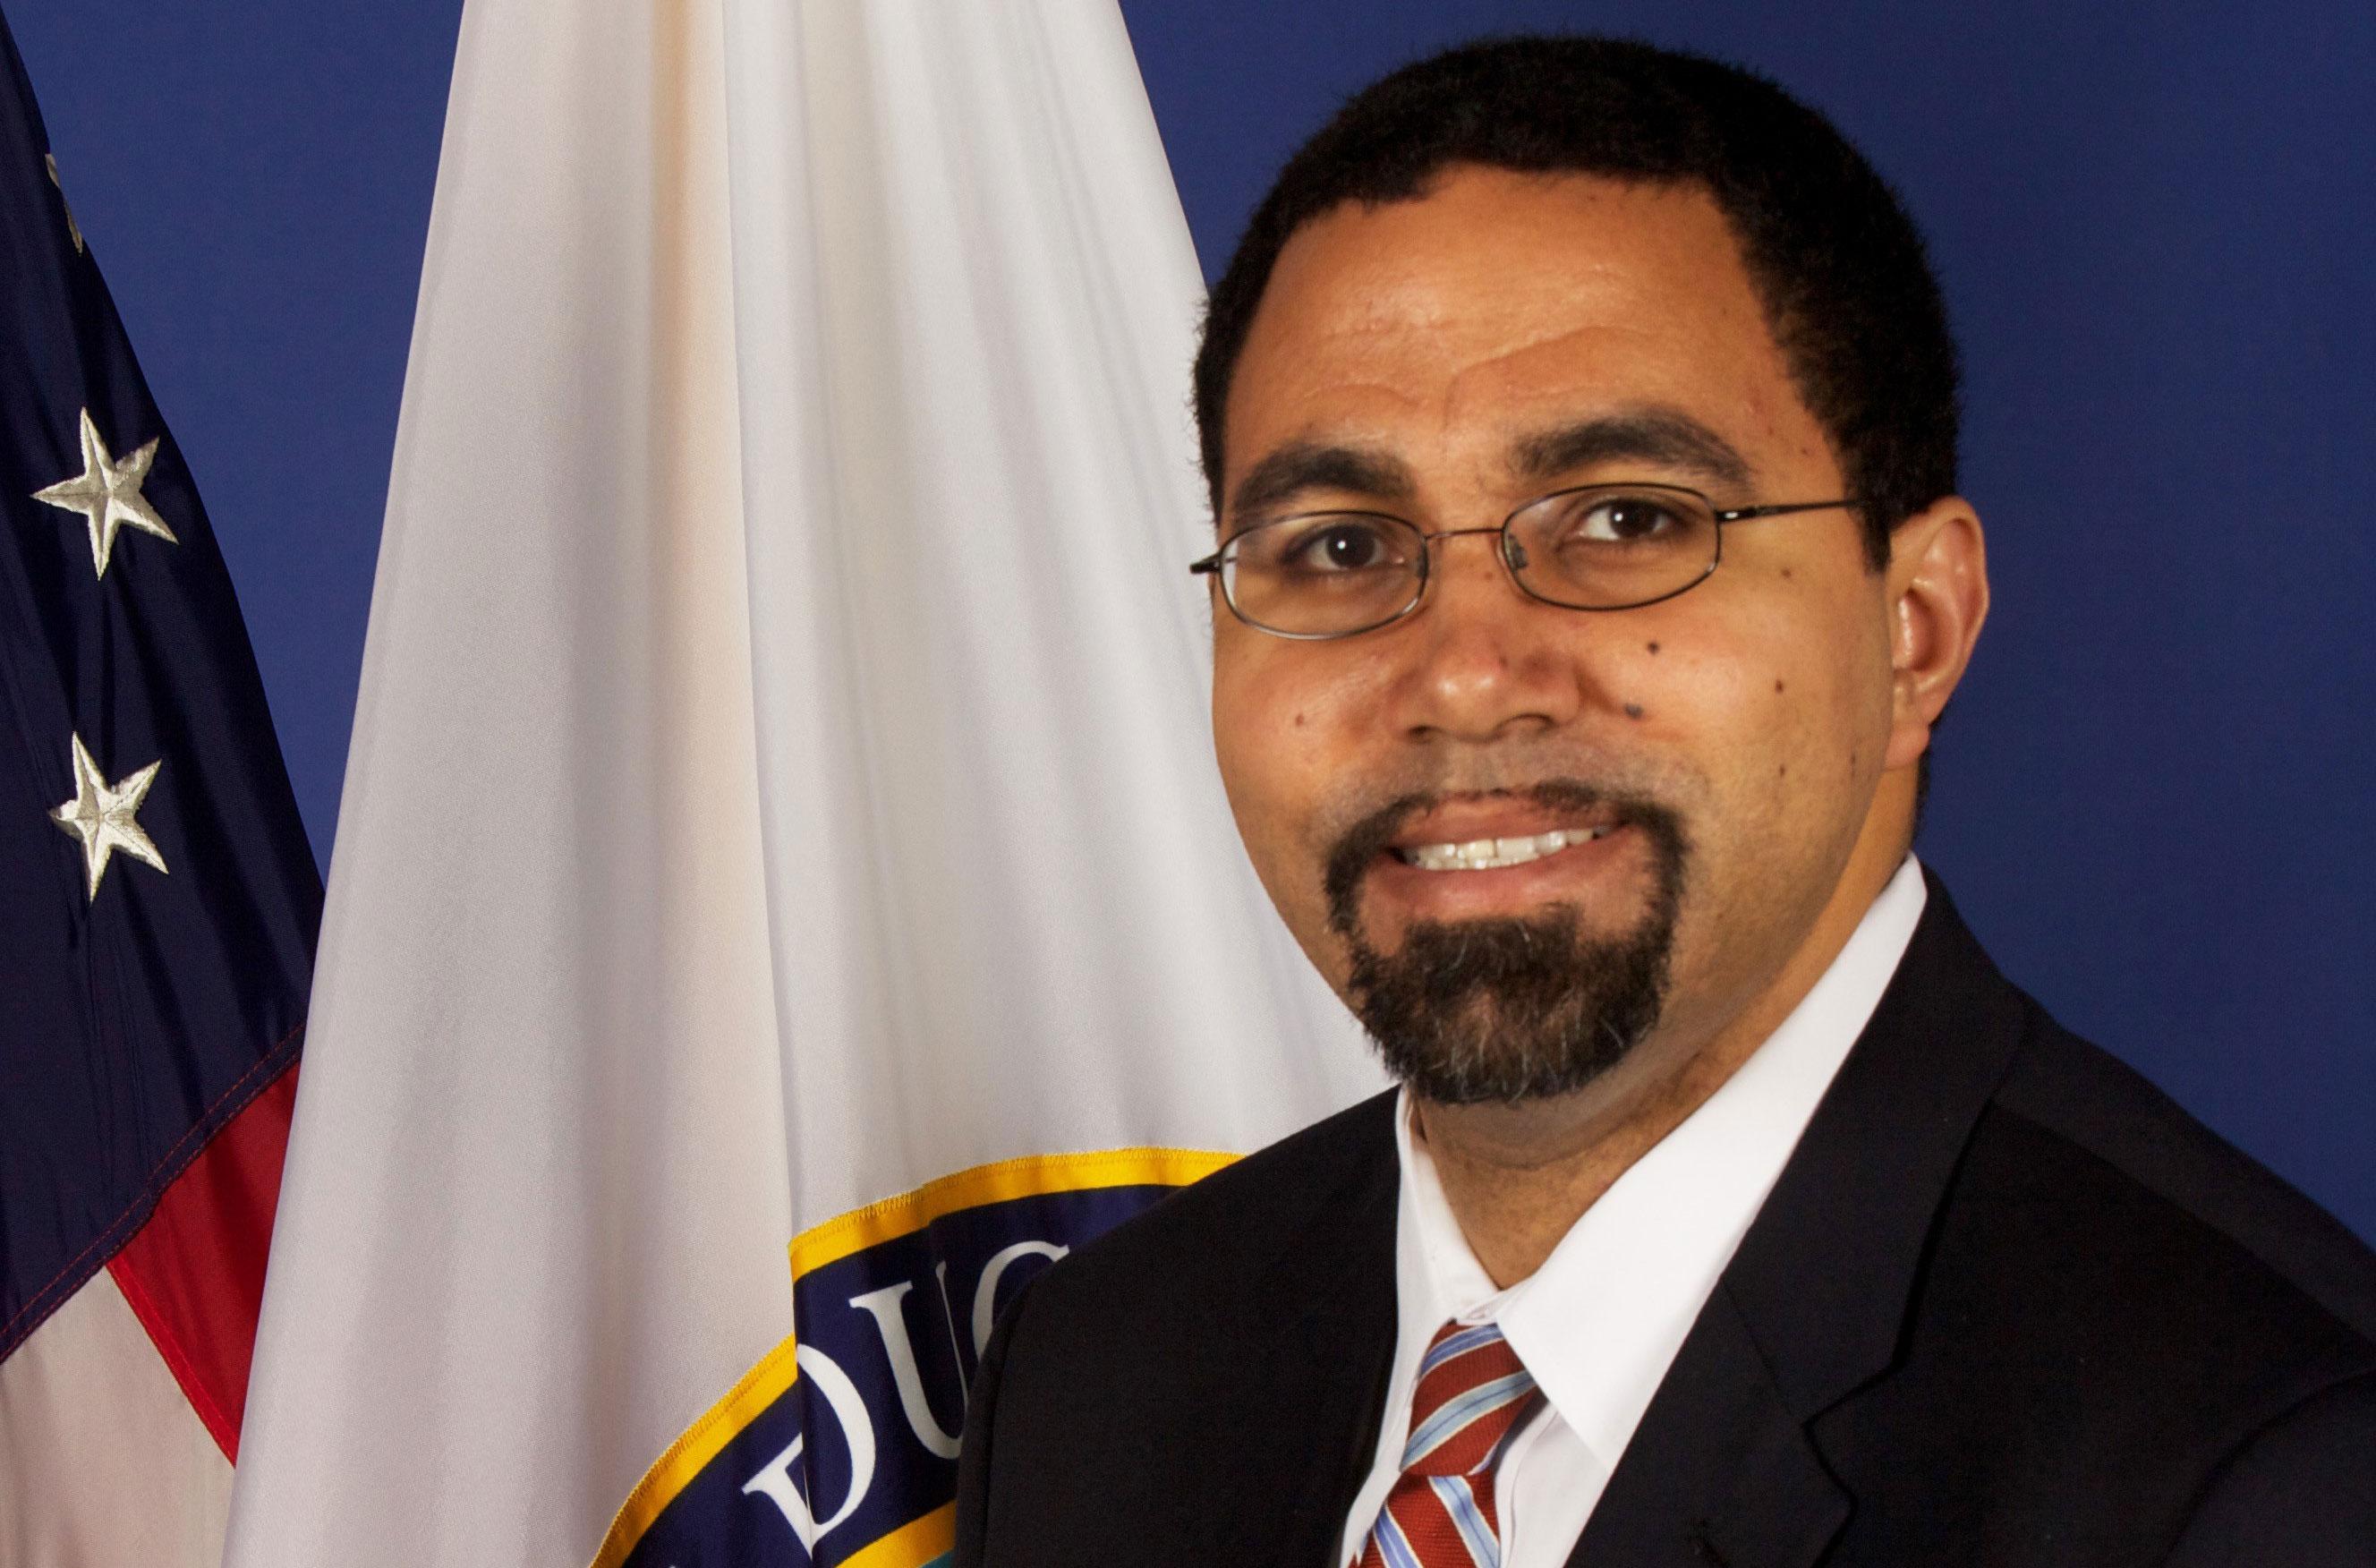 featured image for: U.S. Education Secretary, Leading Academics to Examine Coleman Report's Impact